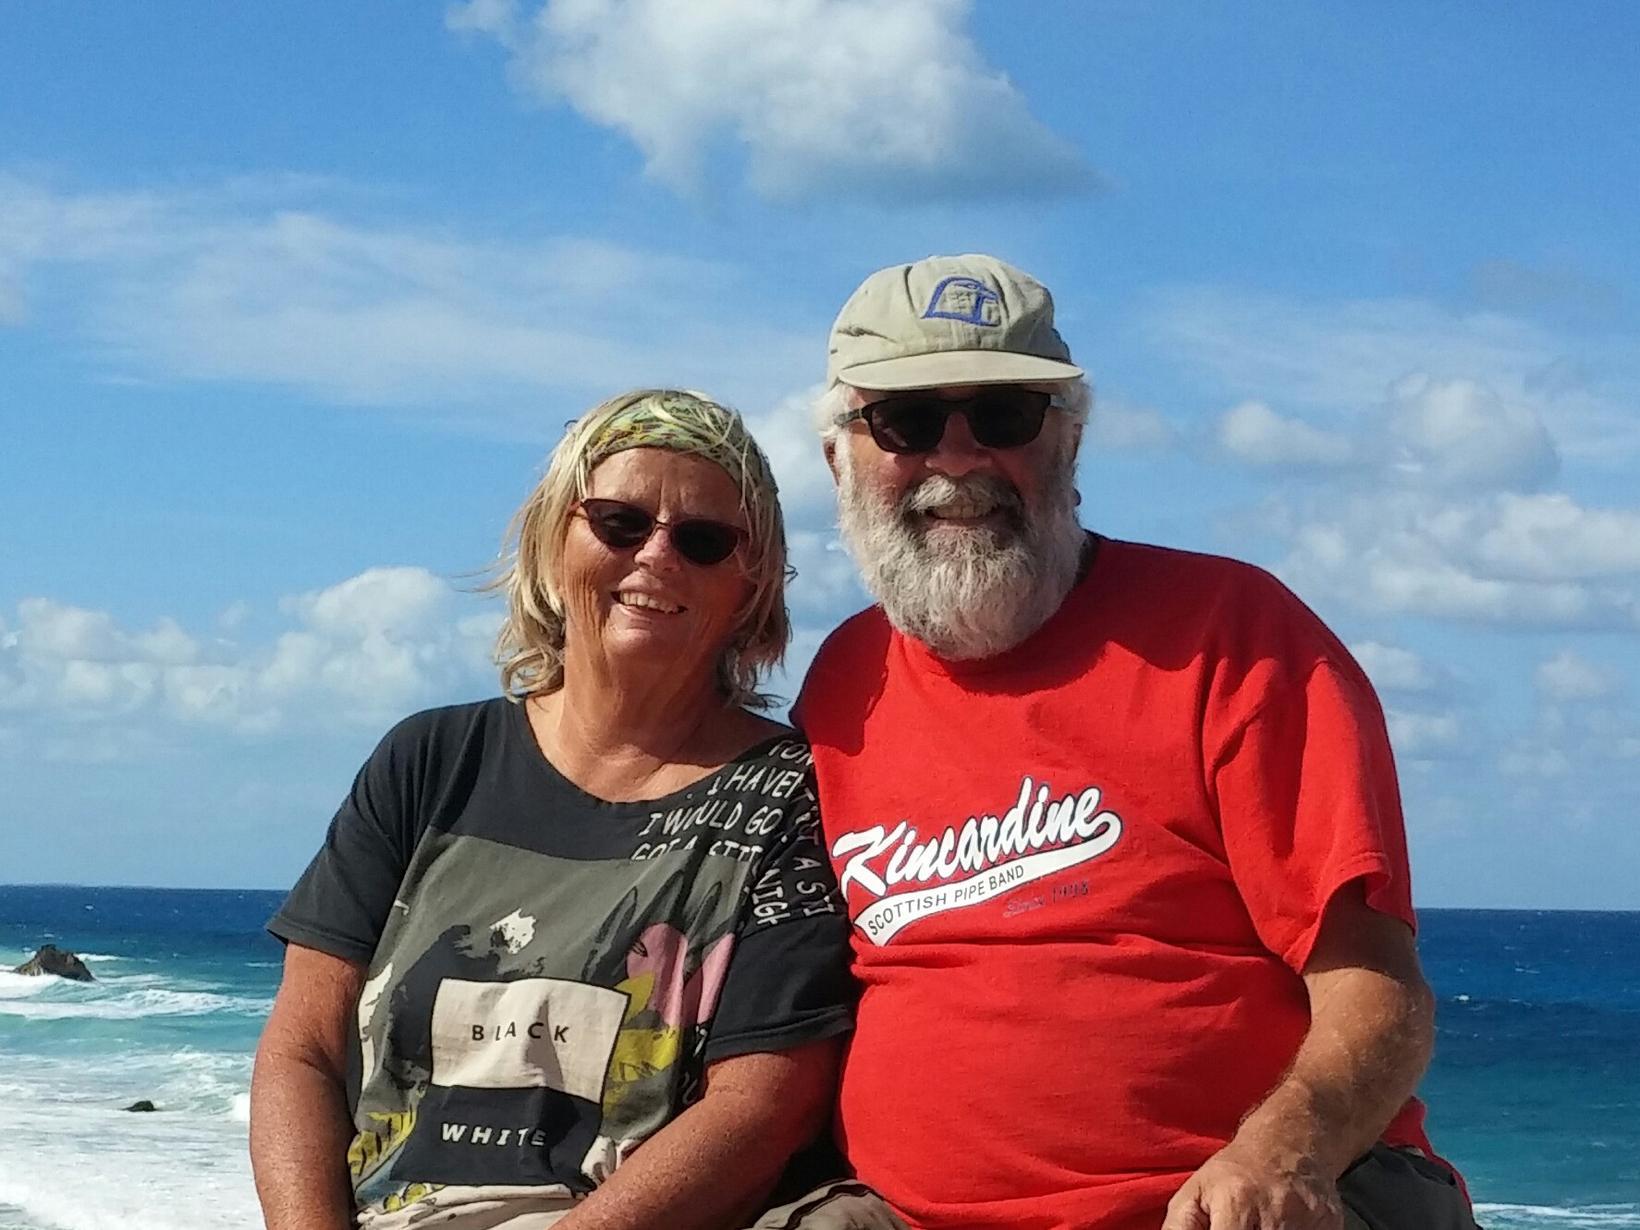 Janet & Jim from Greater Sudbury, Ontario, Canada